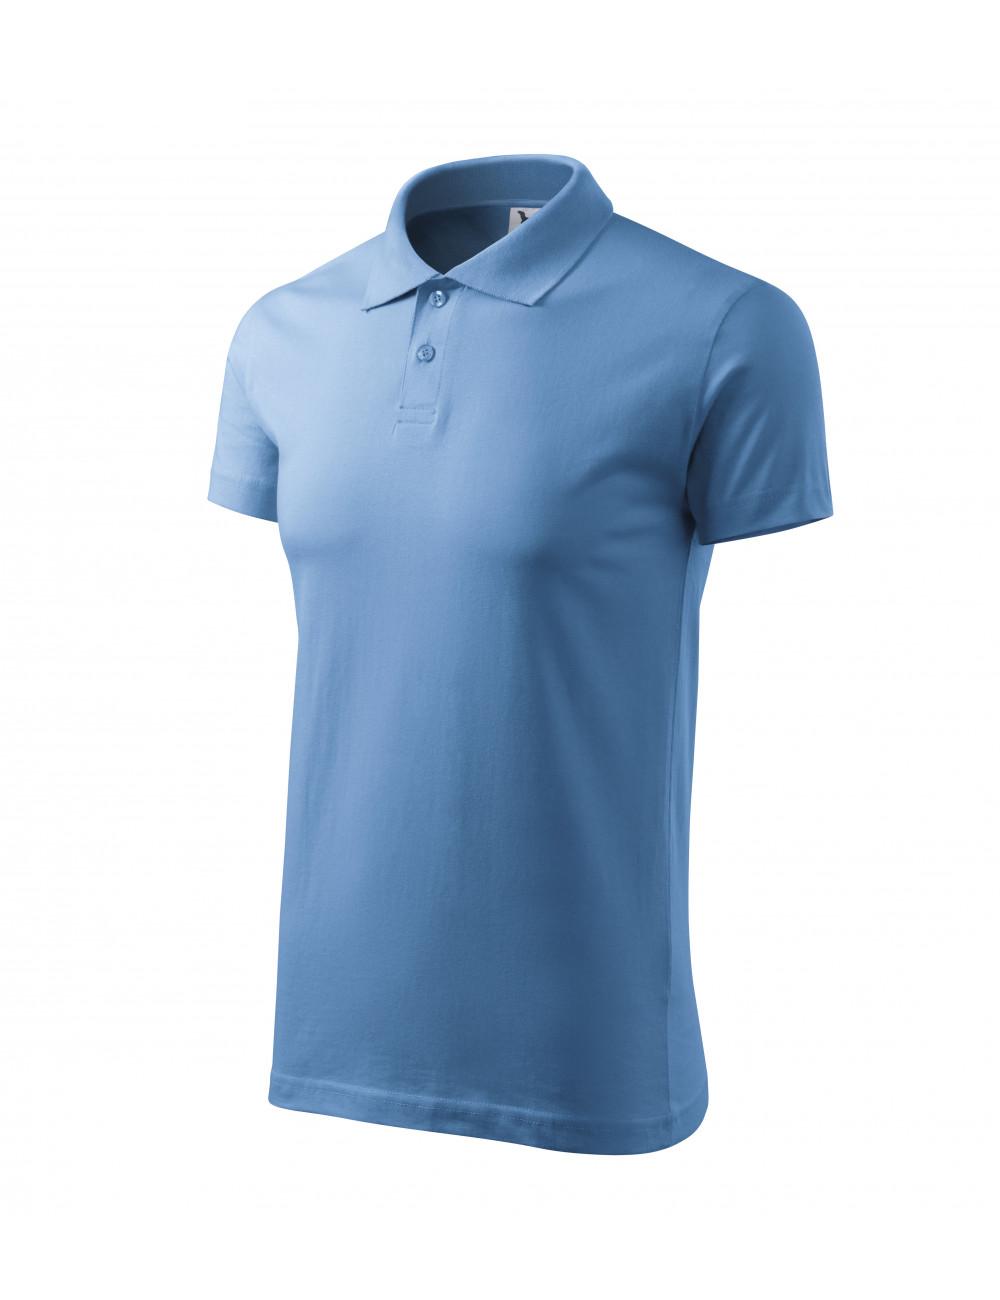 Adler MALFINI Koszulka polo męska Single J. 202 błękitny